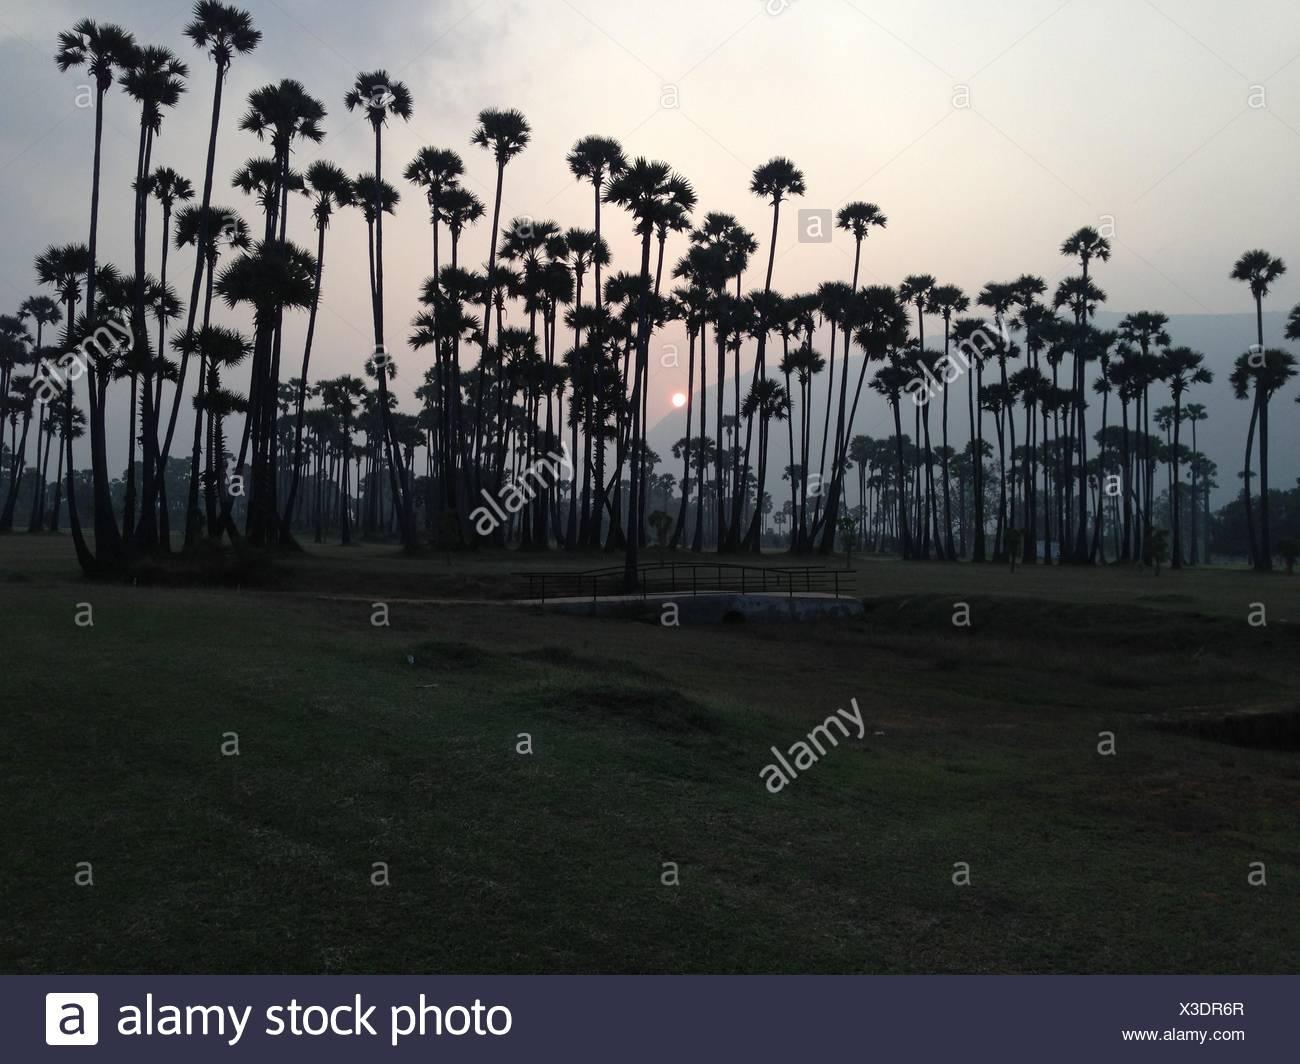 India, Andhra Pradesh, Sunset - Stock Image